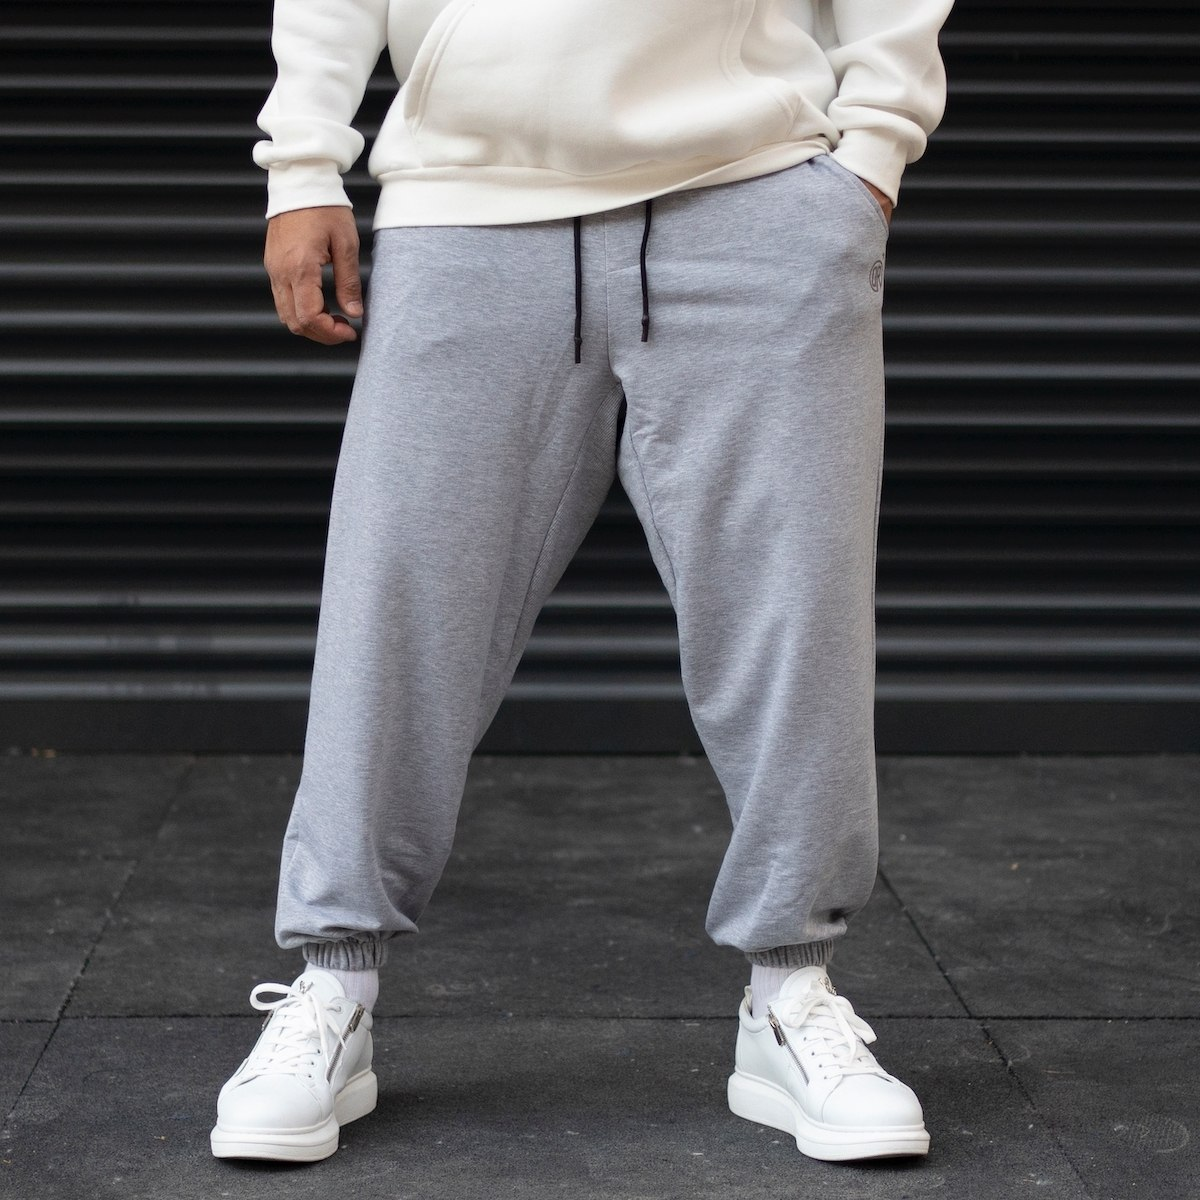 Men's Oversize Wide Cut Elastic Hem Sweatpants In Gray